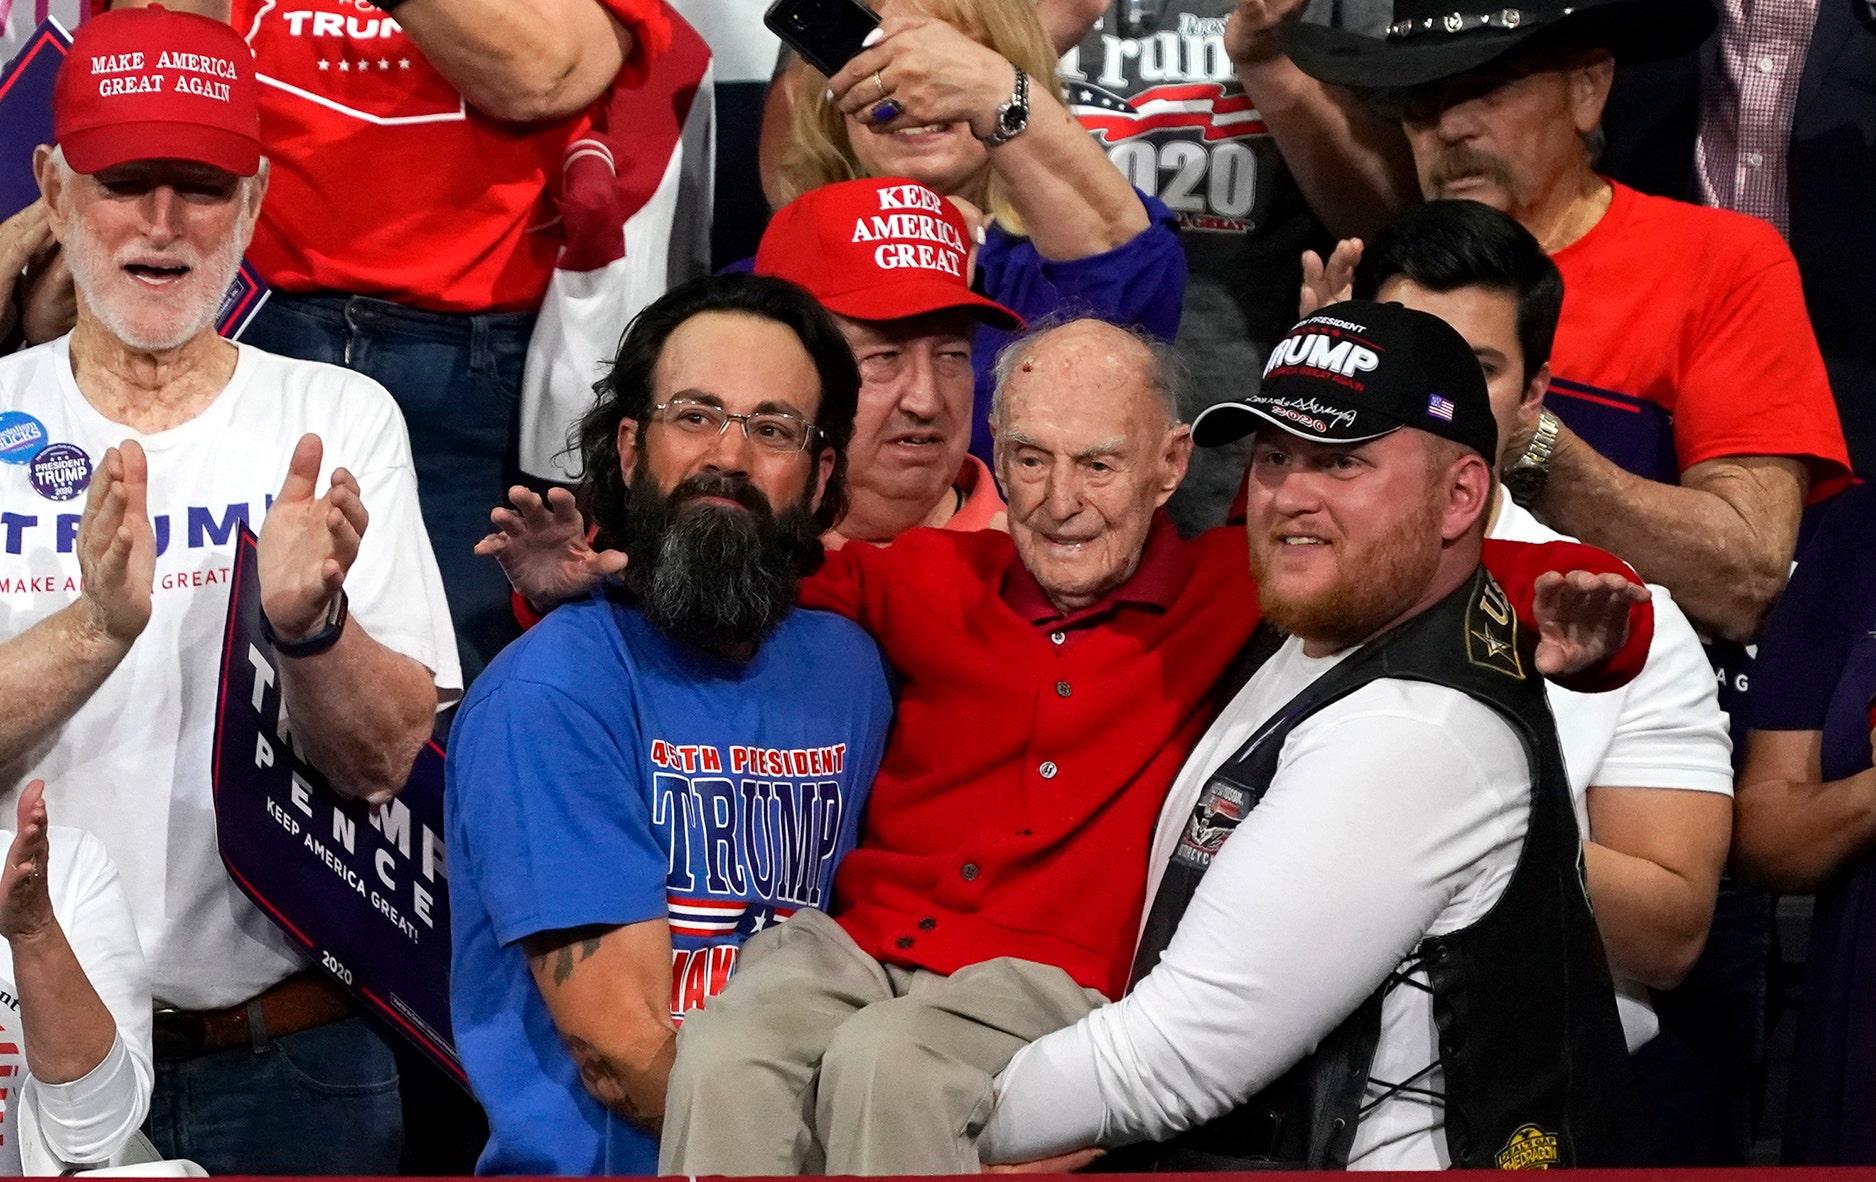 Arizona veteran Ervin Julian -- carried to seat at Trump rally -- dead at 100: report